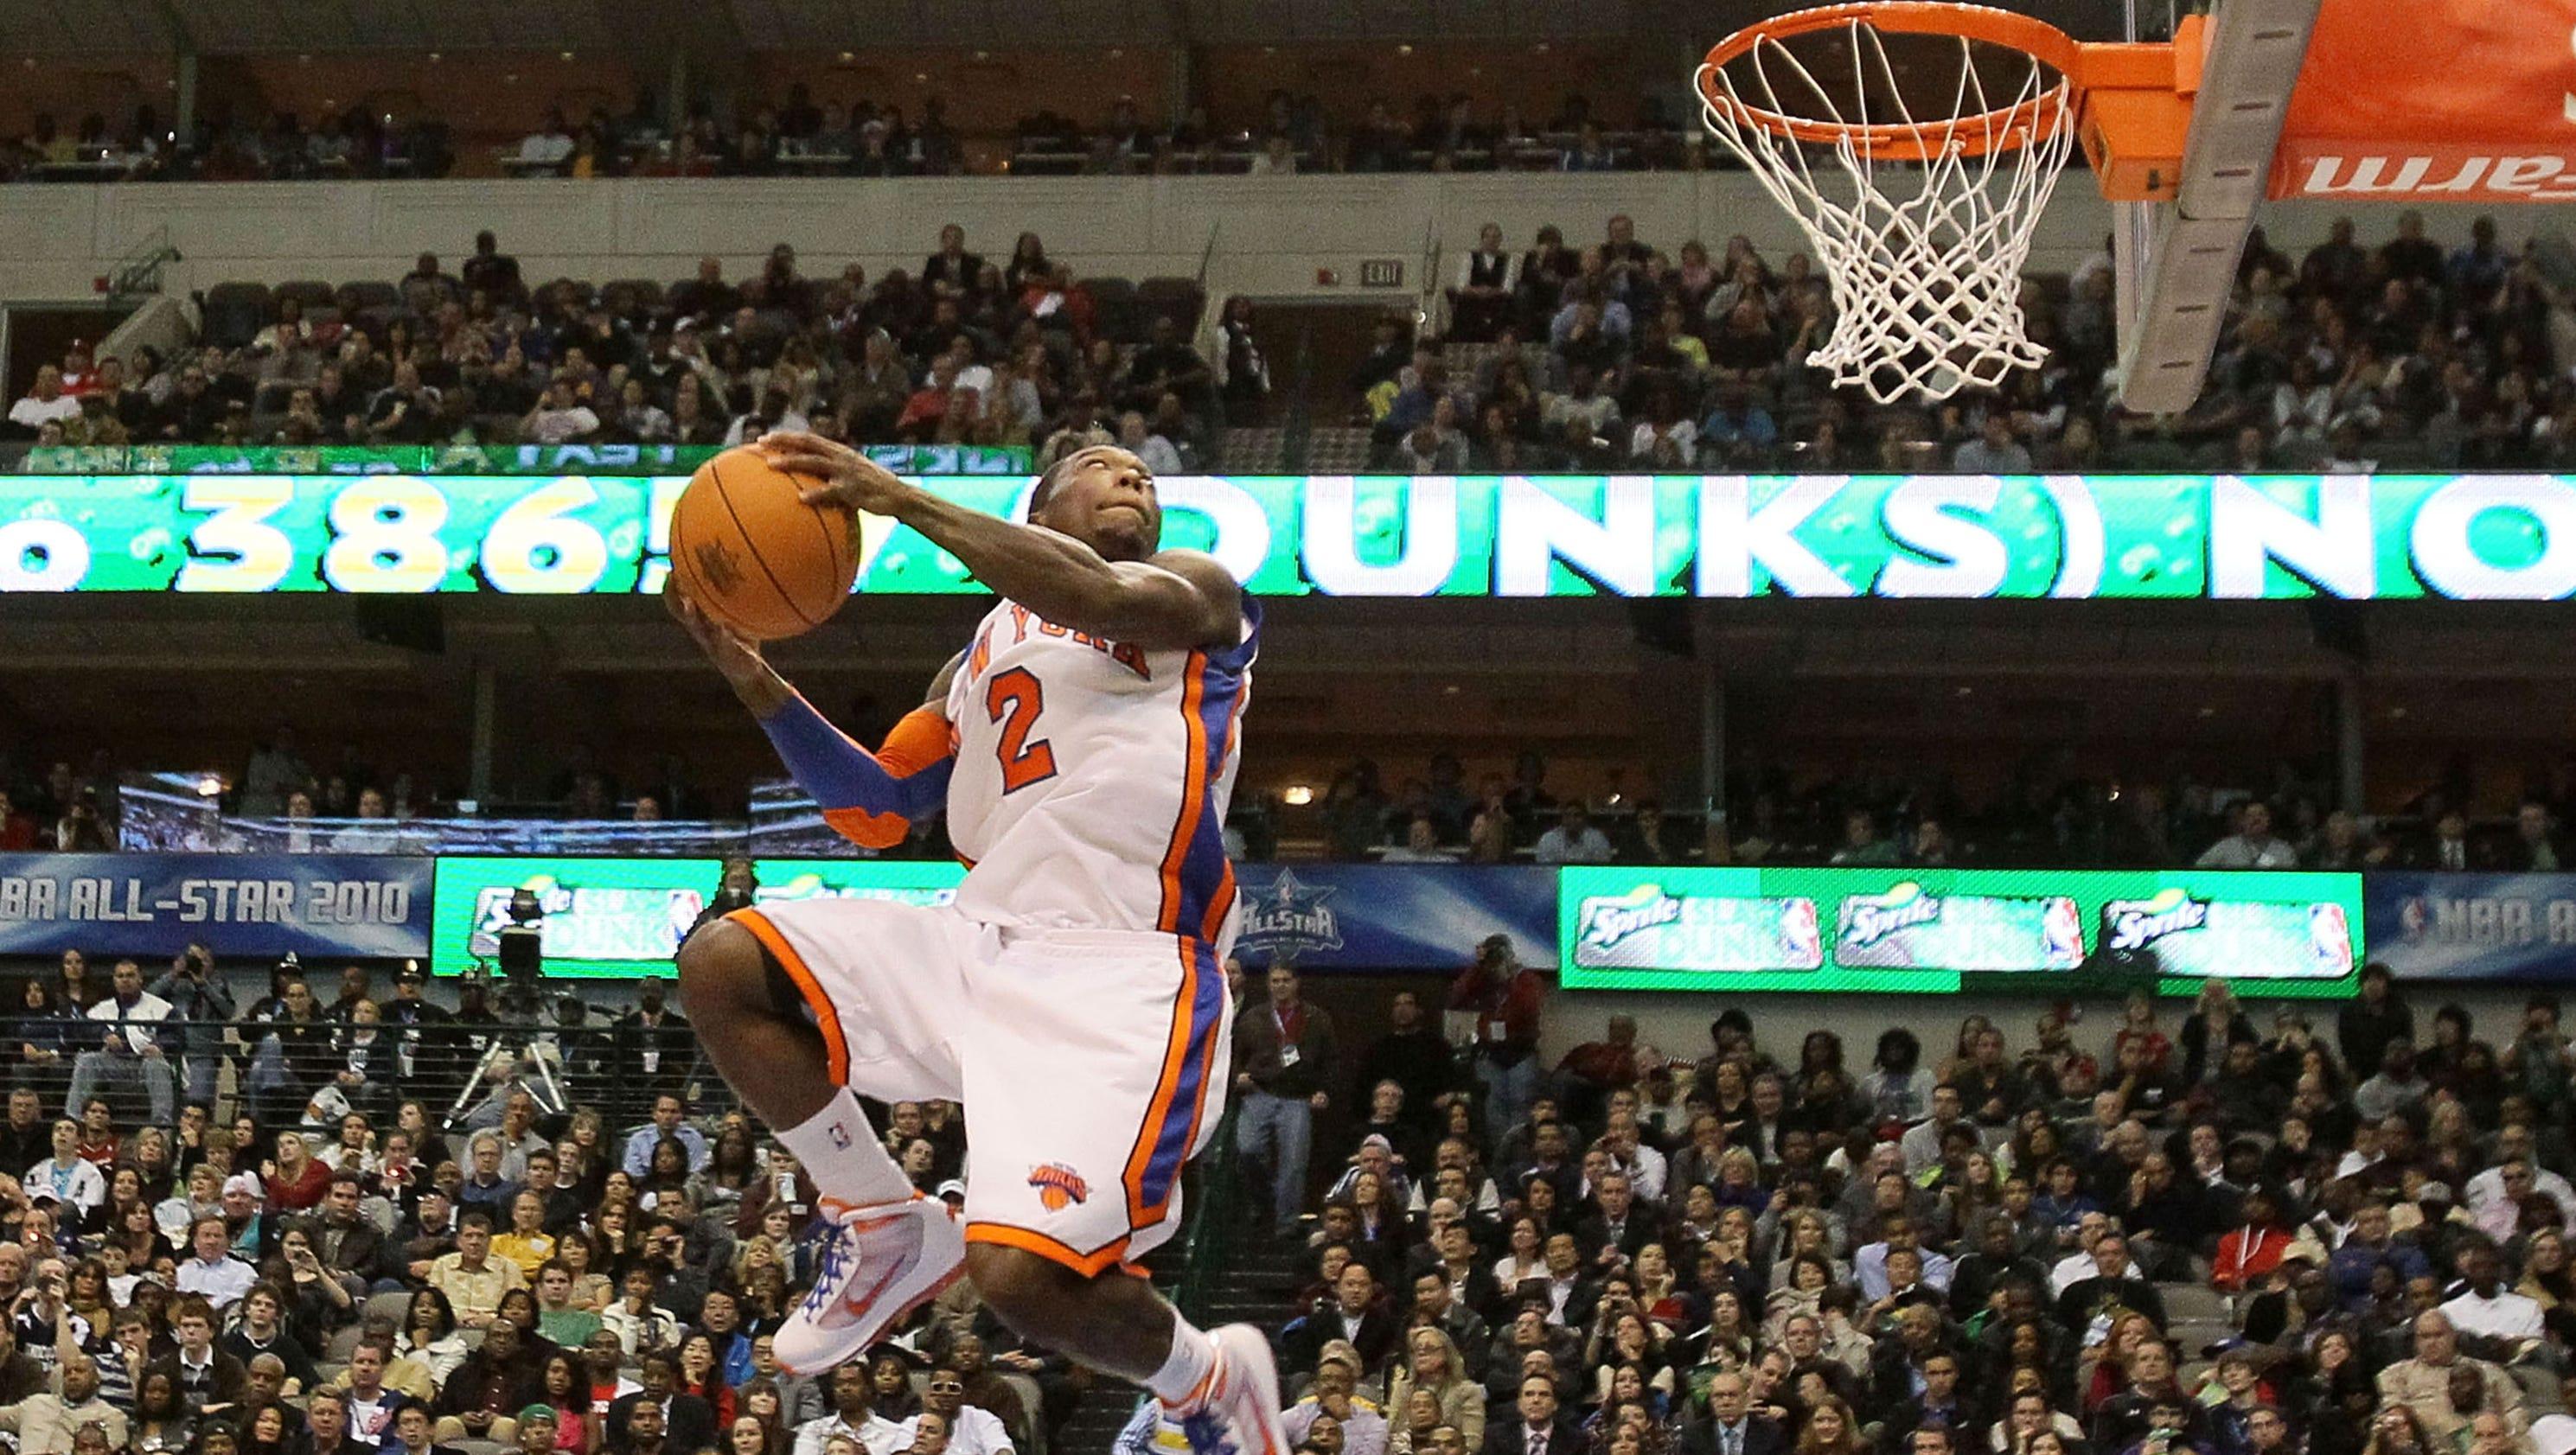 Nate-robinson-dunk